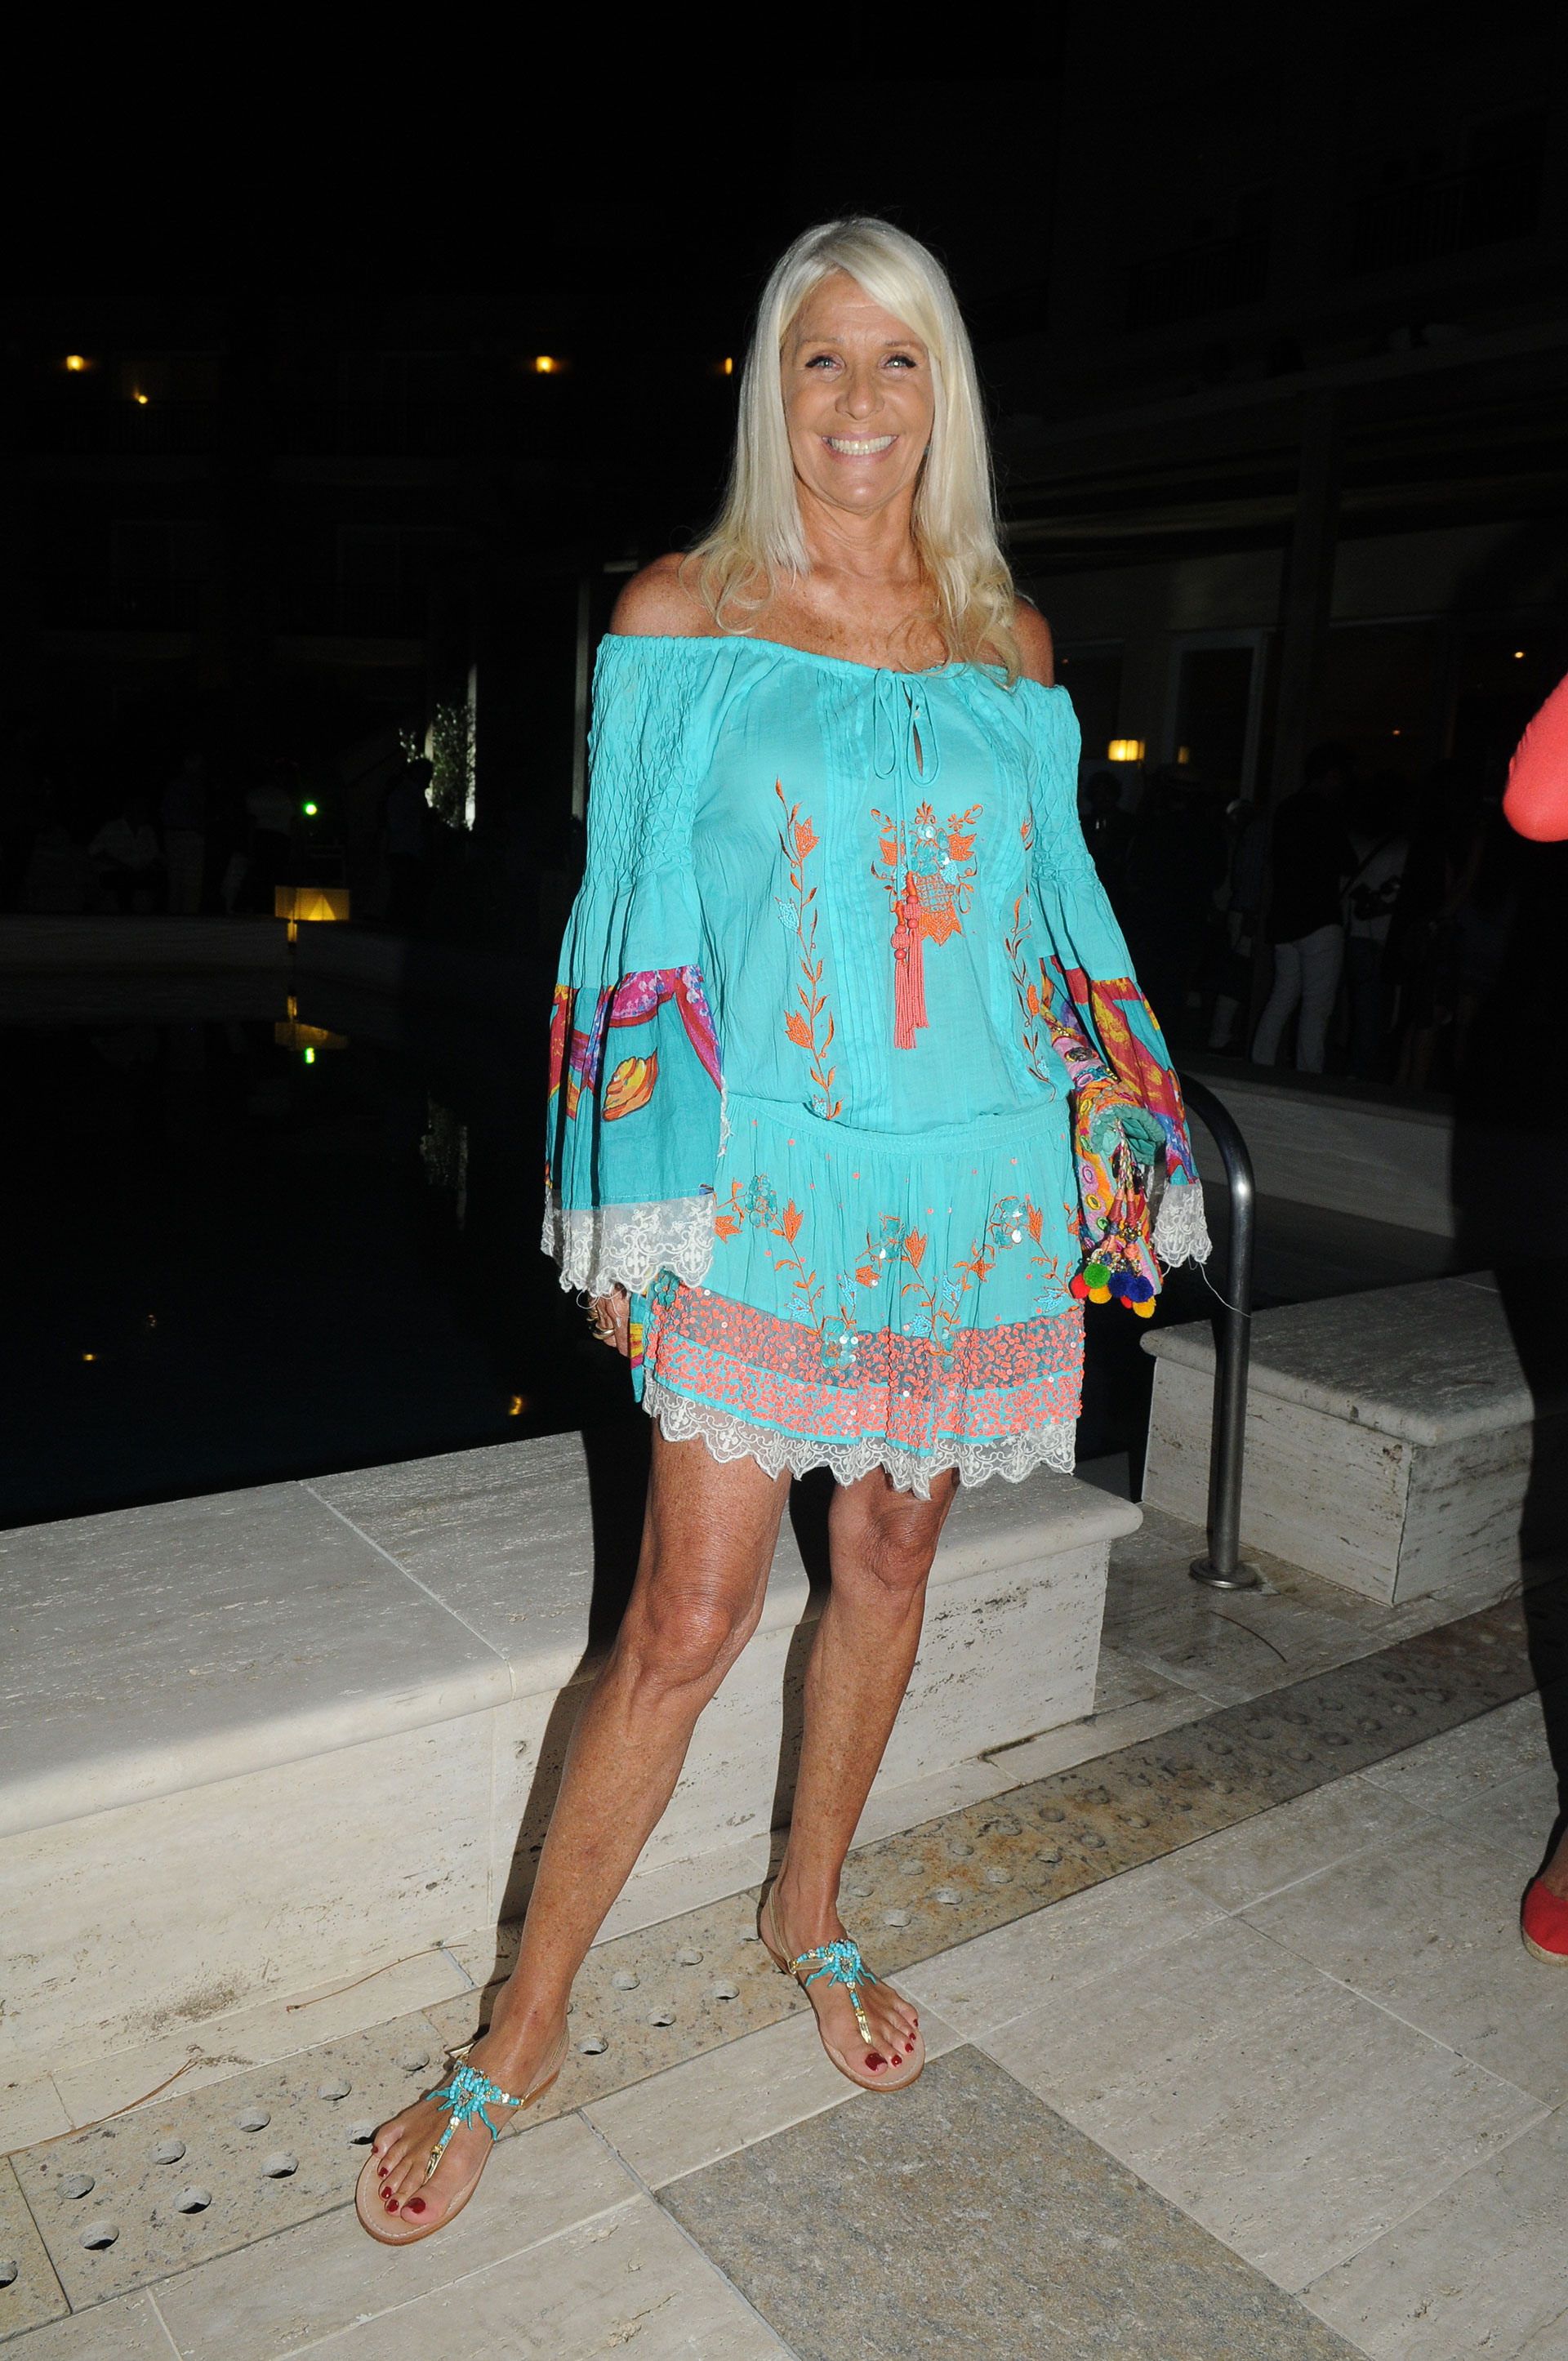 Susana de garcia luna park - 2 part 8